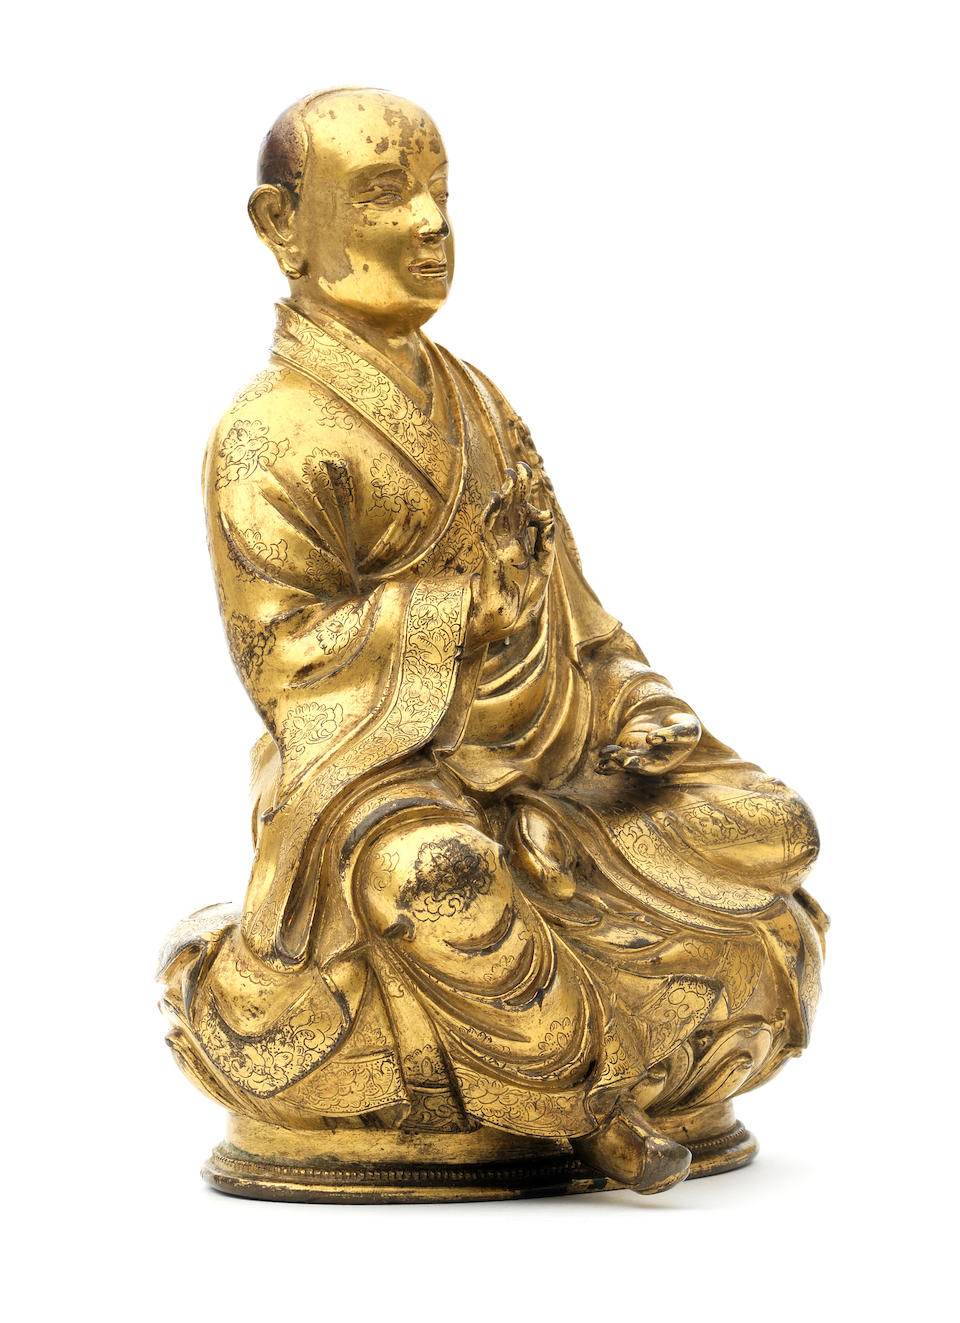 A rare inscribed gilt-copper alloy figure of arhat Bhadra Tibet, 17th century